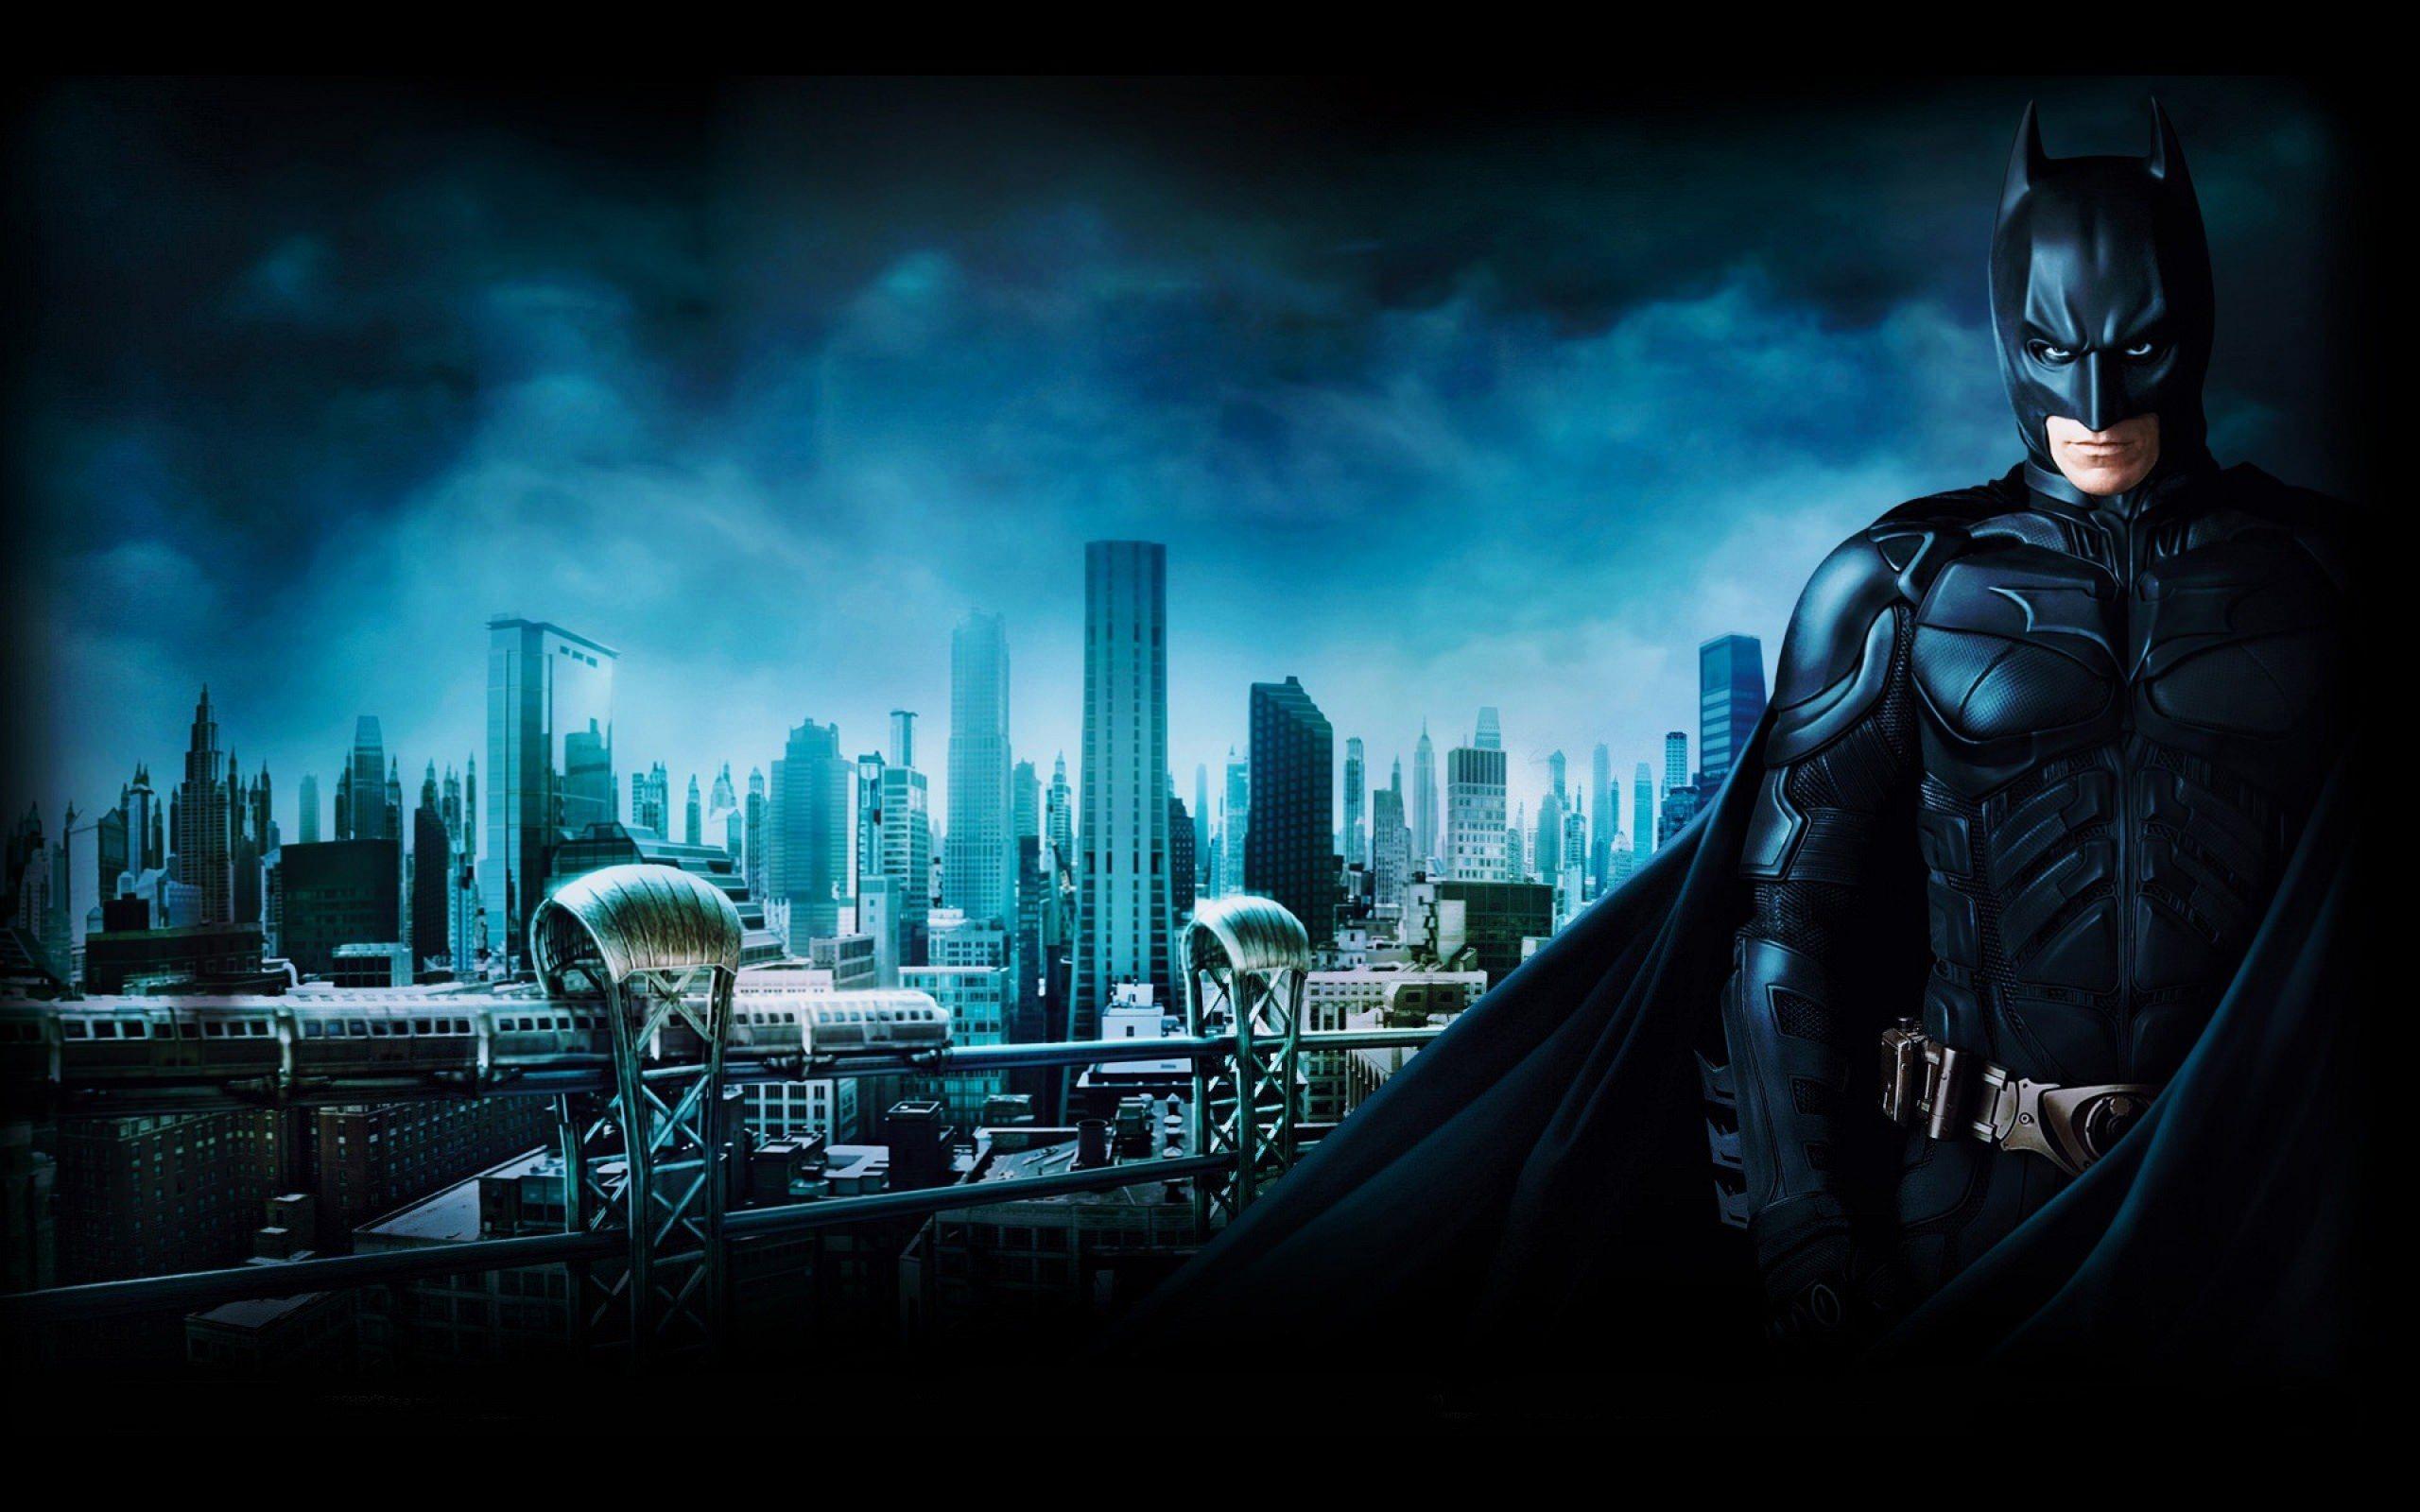 74 Super Hero Backgrounds On Wallpapersafari